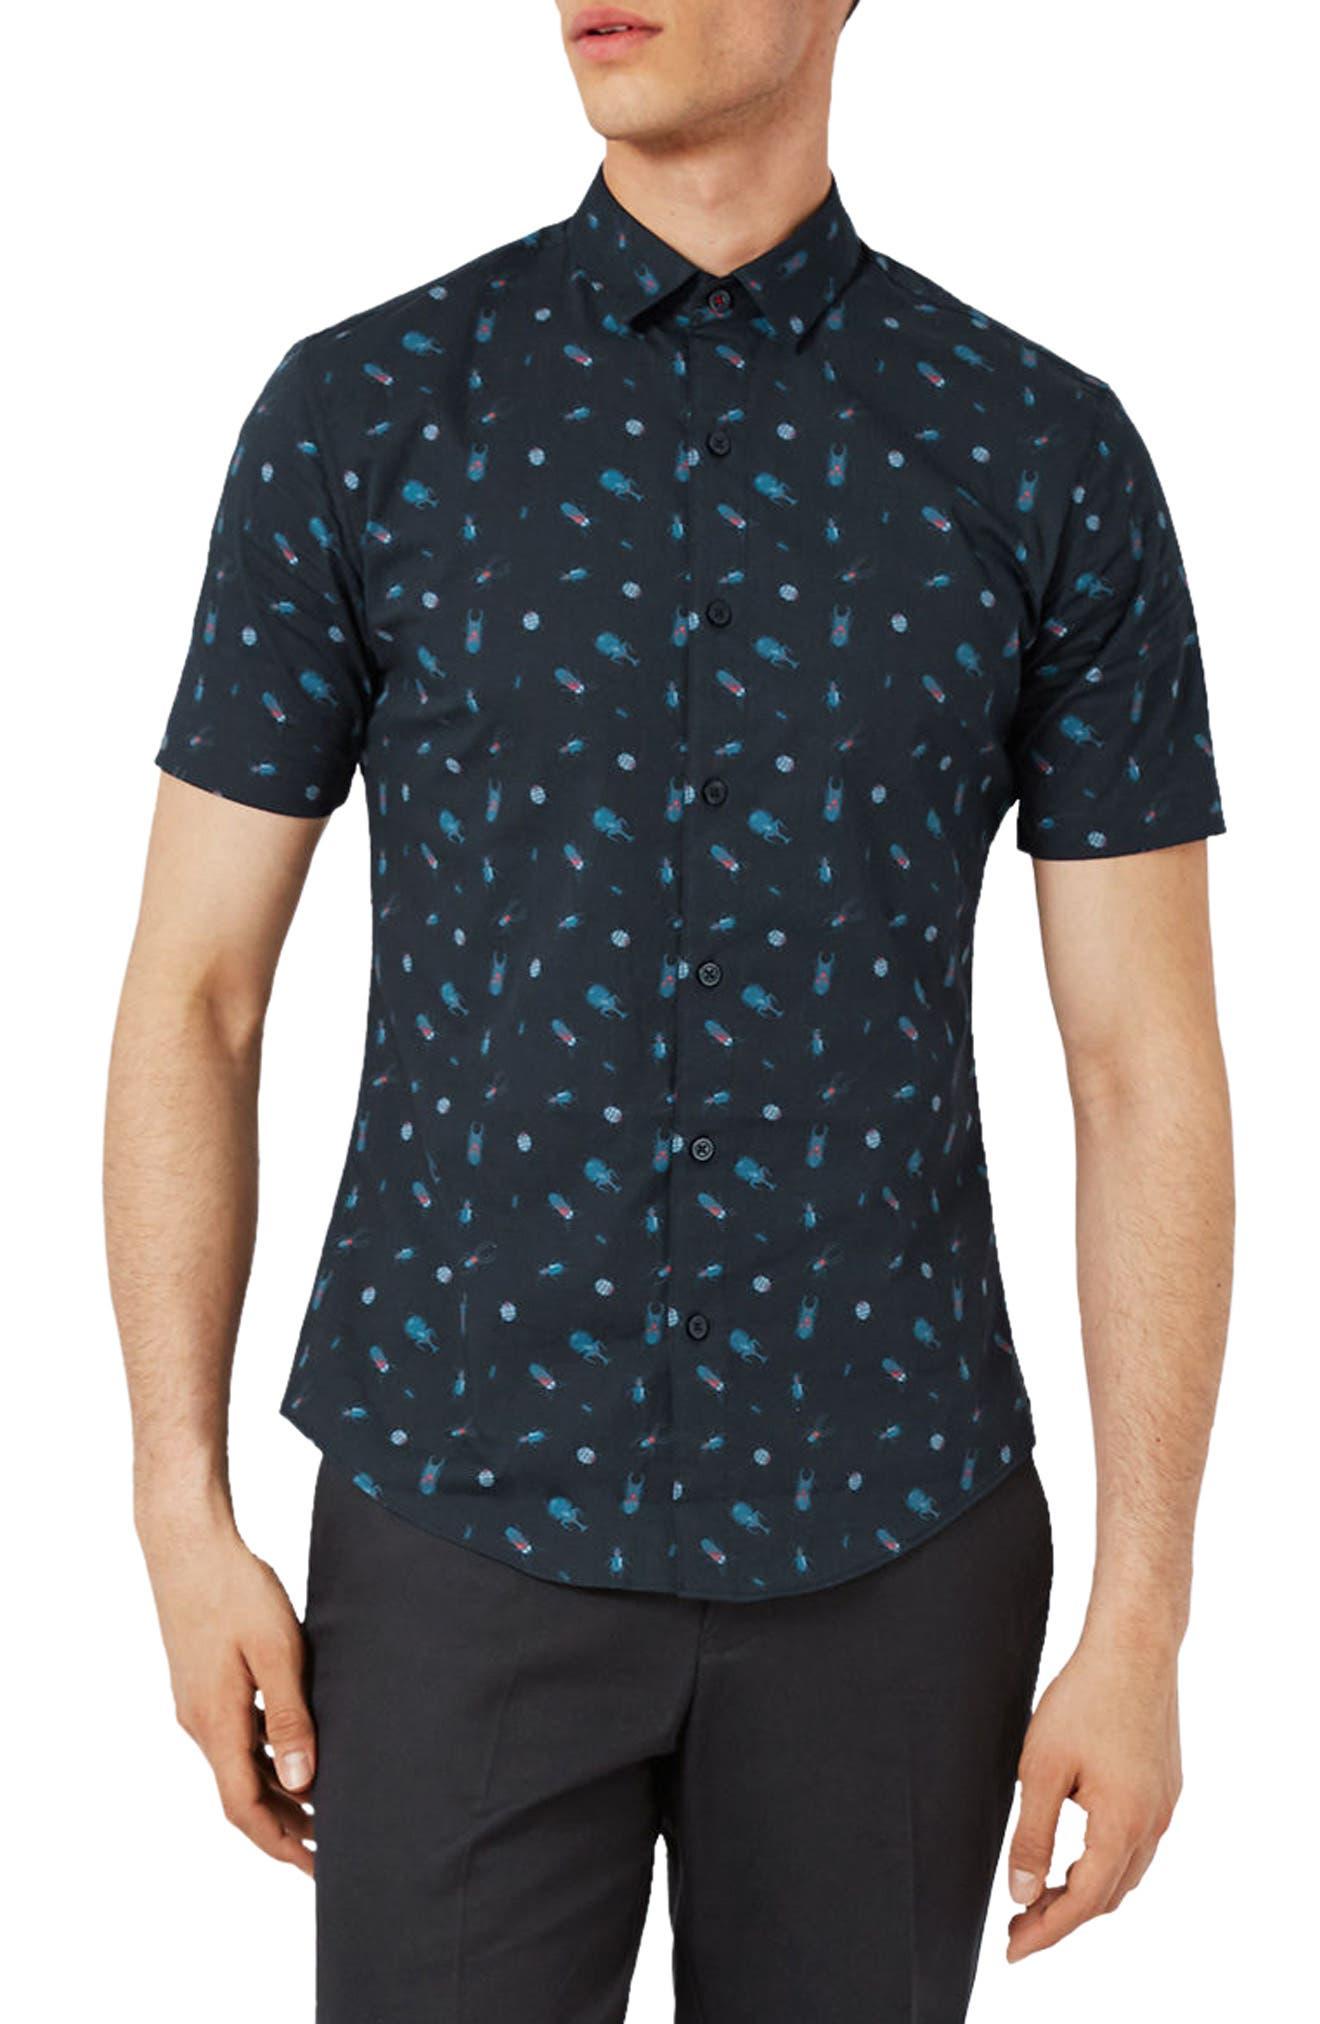 Topman Muscle Fit Bug Print Shirt